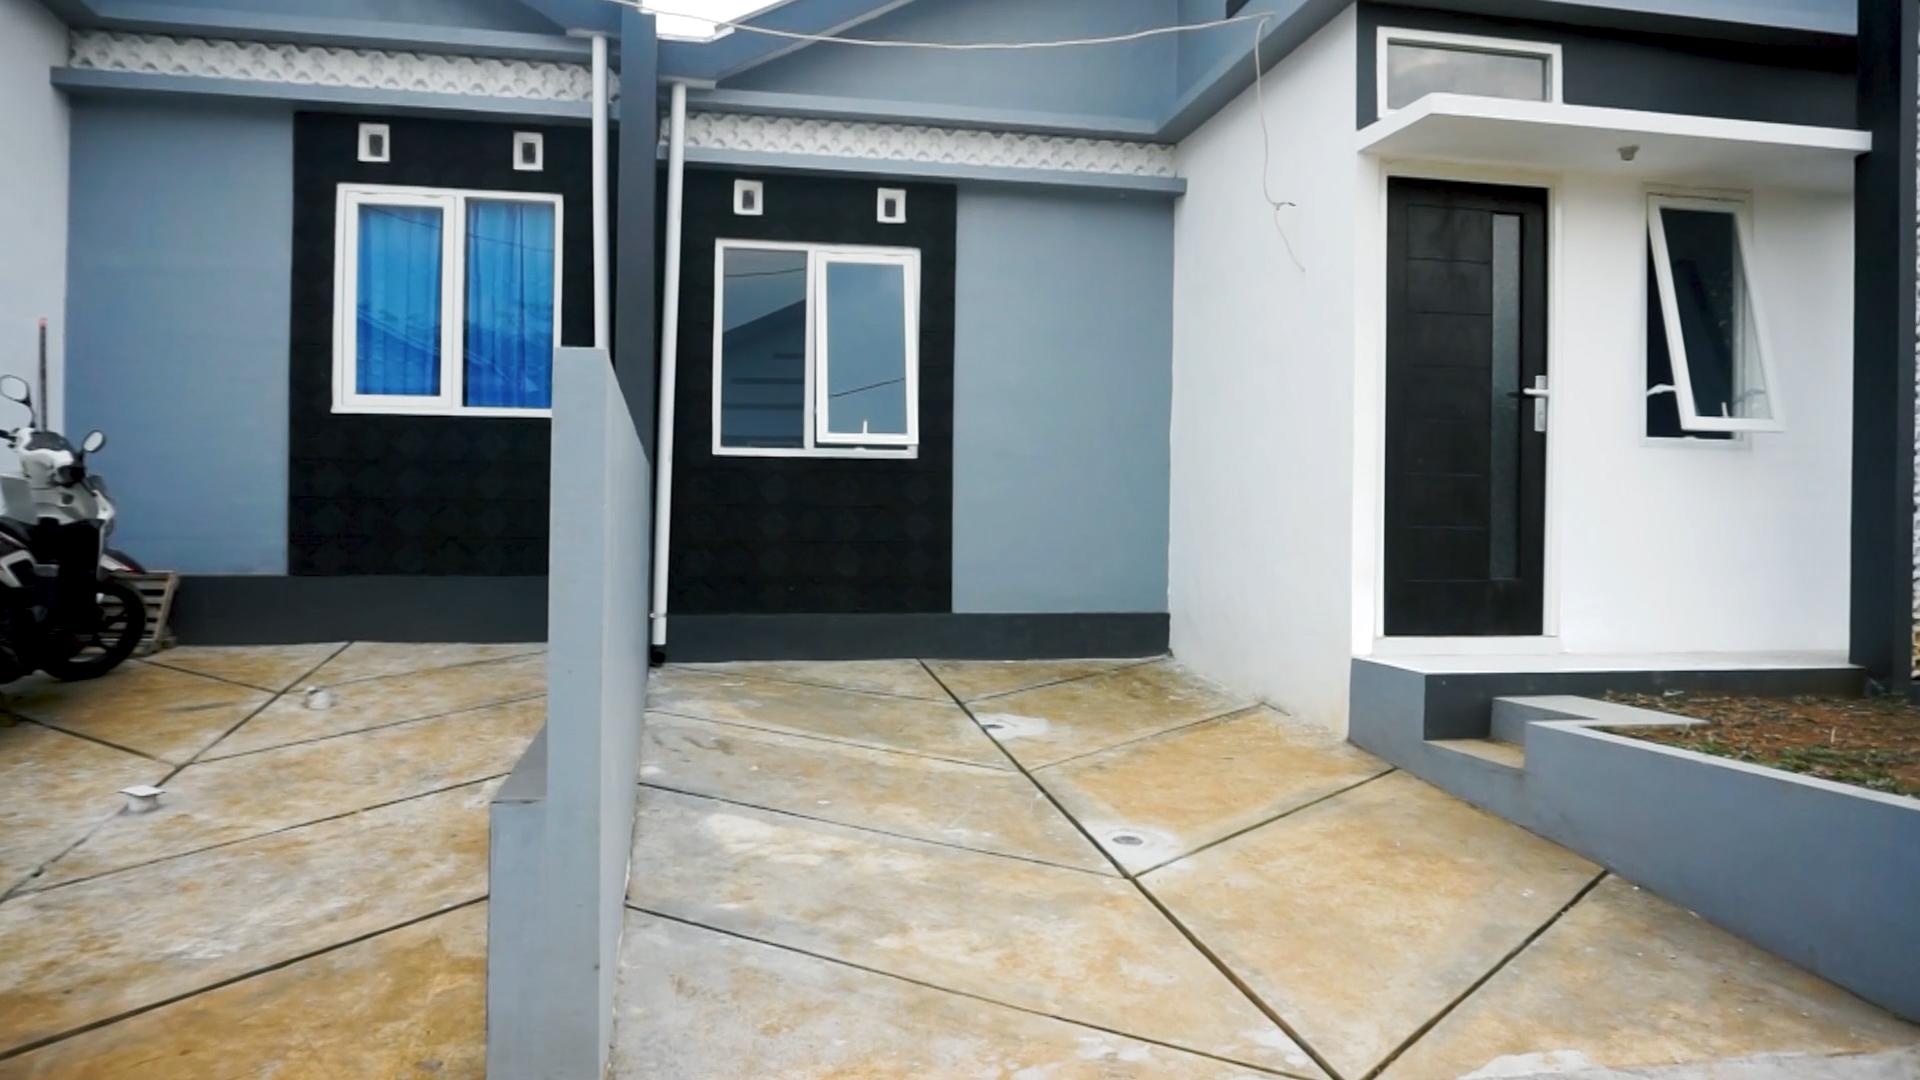 Contoh Warna Mobnokrom - rumah dijual di batu malang 2020